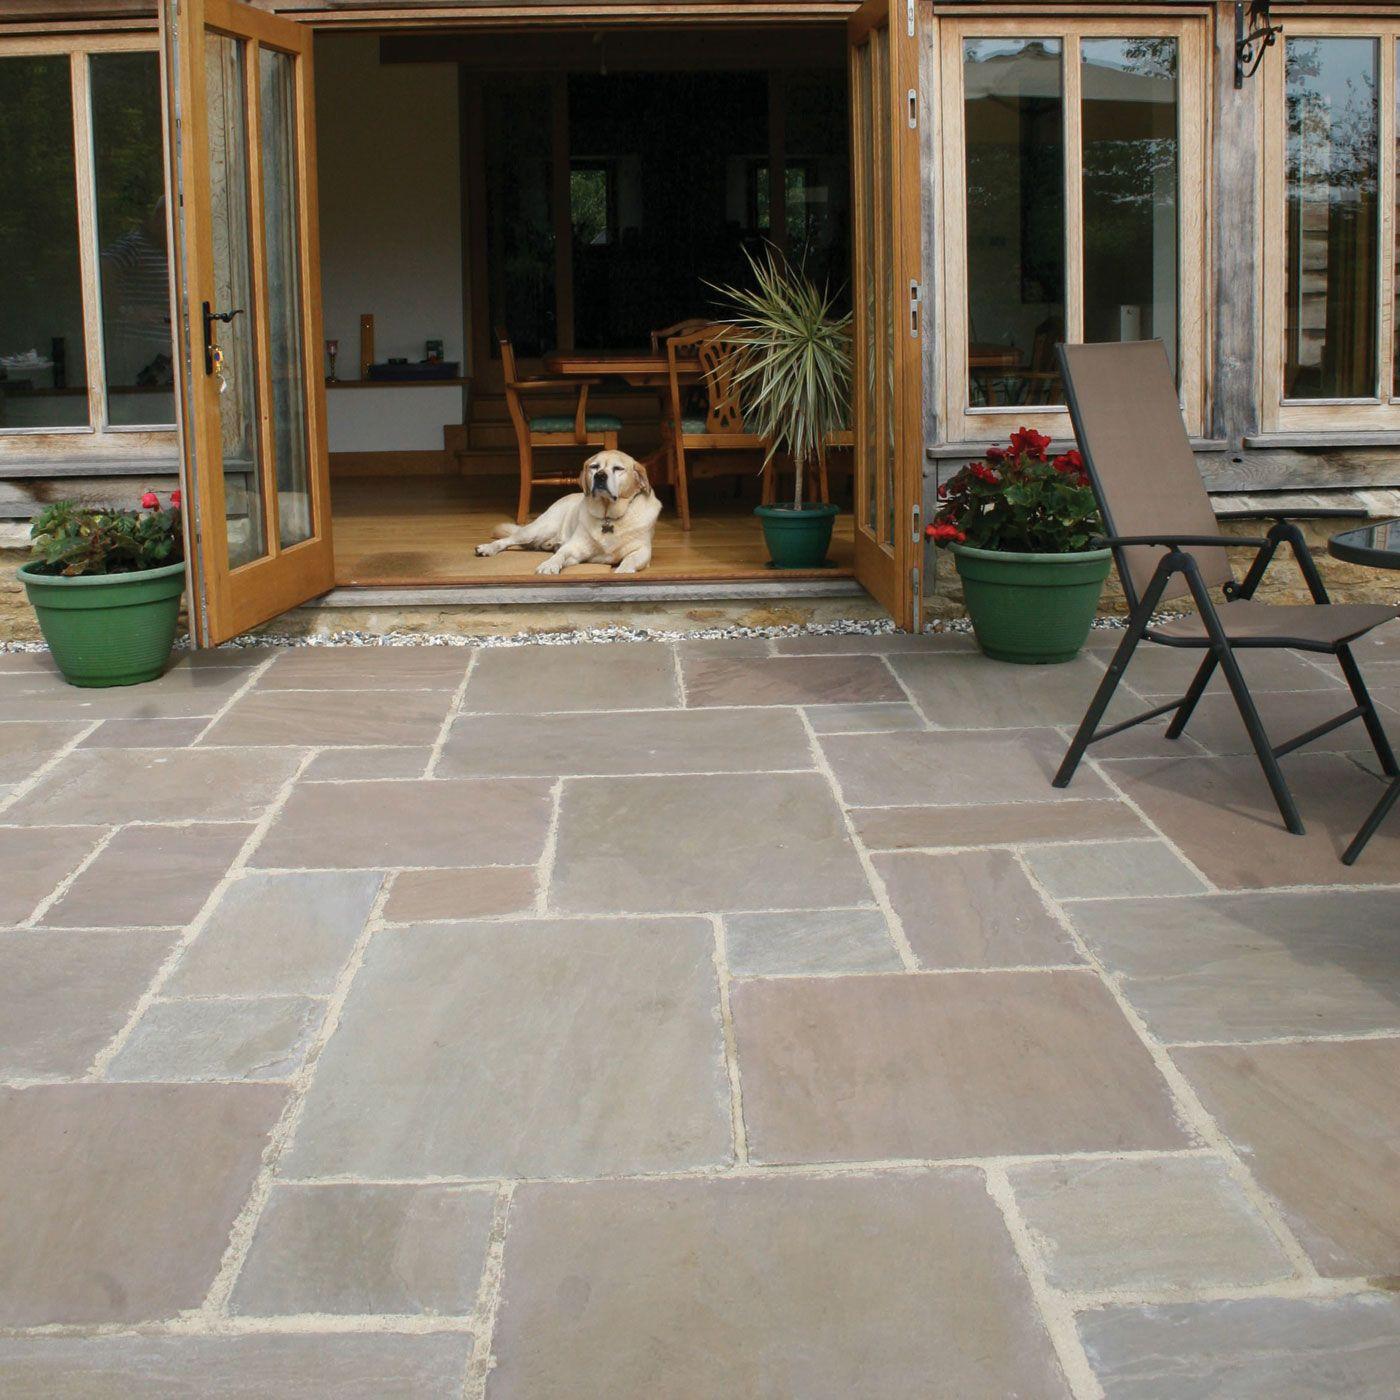 pavestone paving antique sandstone 39 tudor 39 oxford paving slabs patio pinterest terrasses. Black Bedroom Furniture Sets. Home Design Ideas